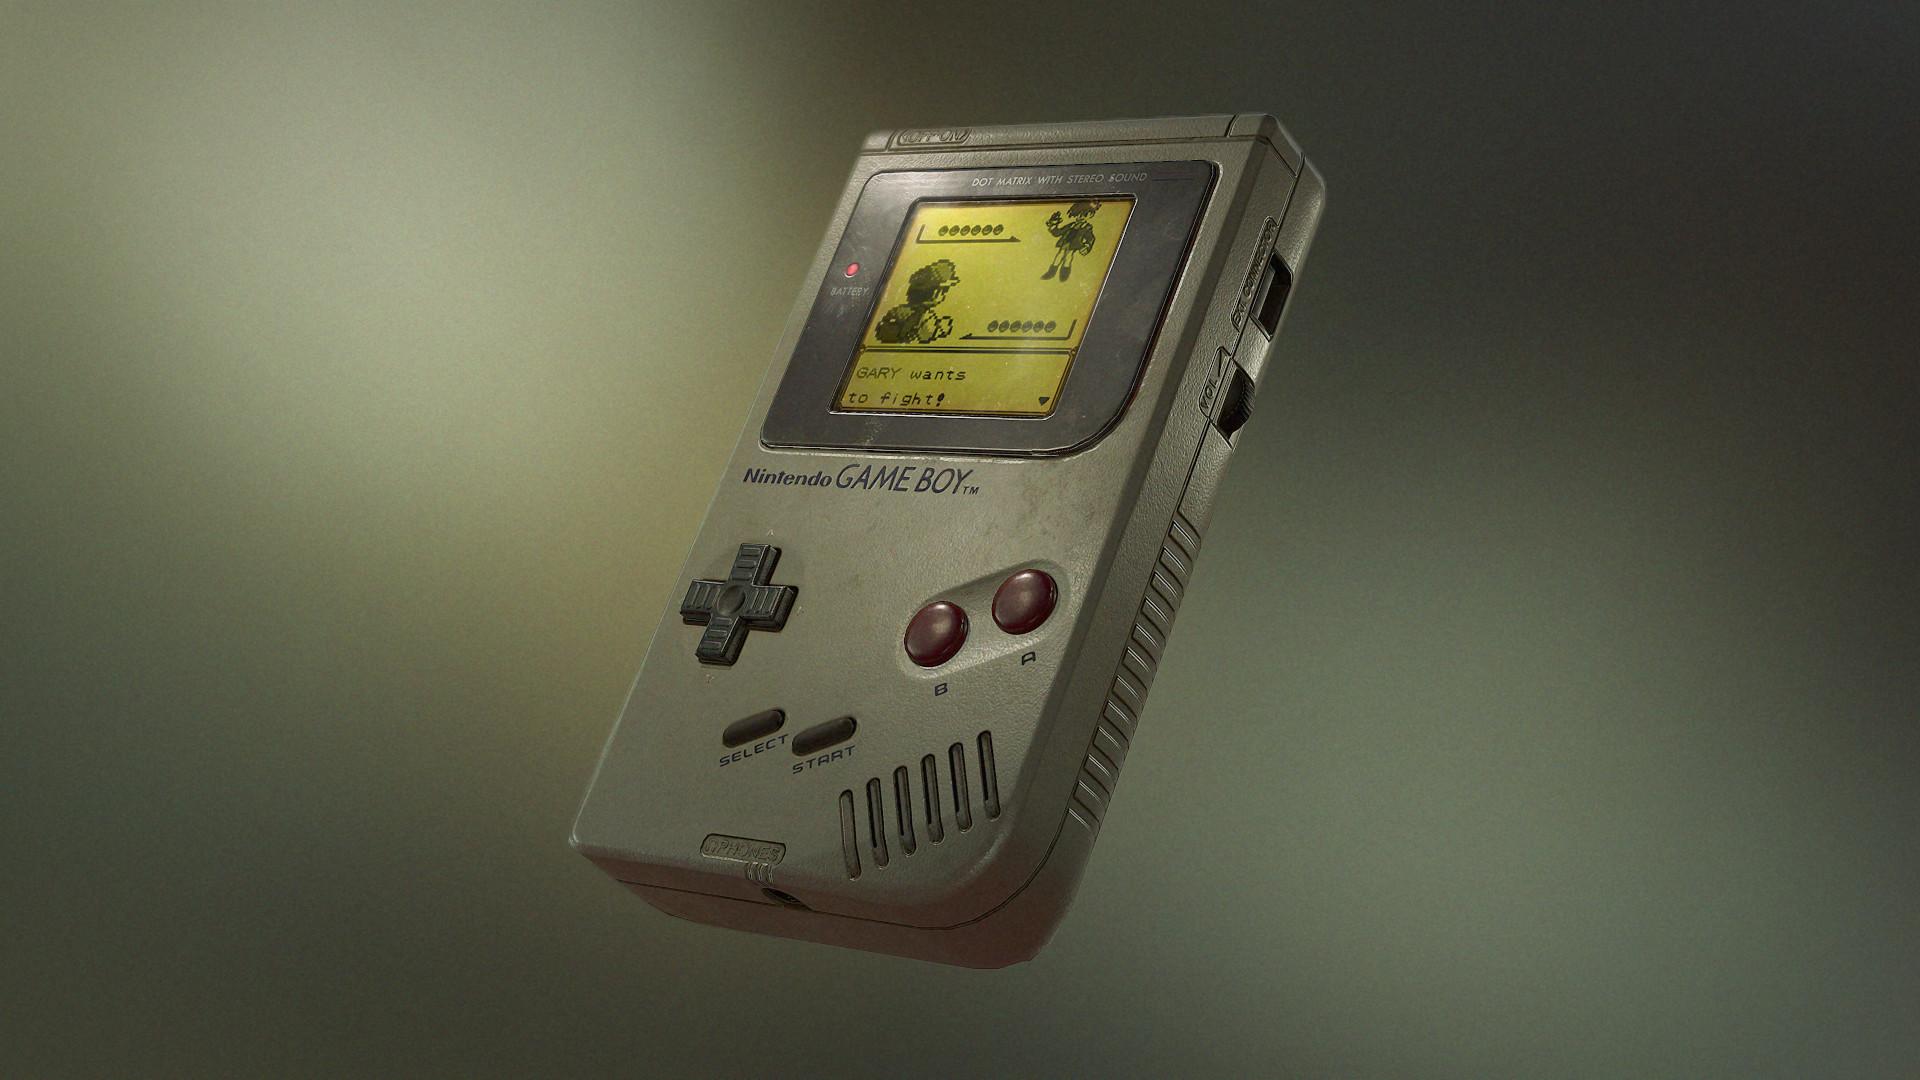 Nintendo Game Boy Hd - HD Wallpaper